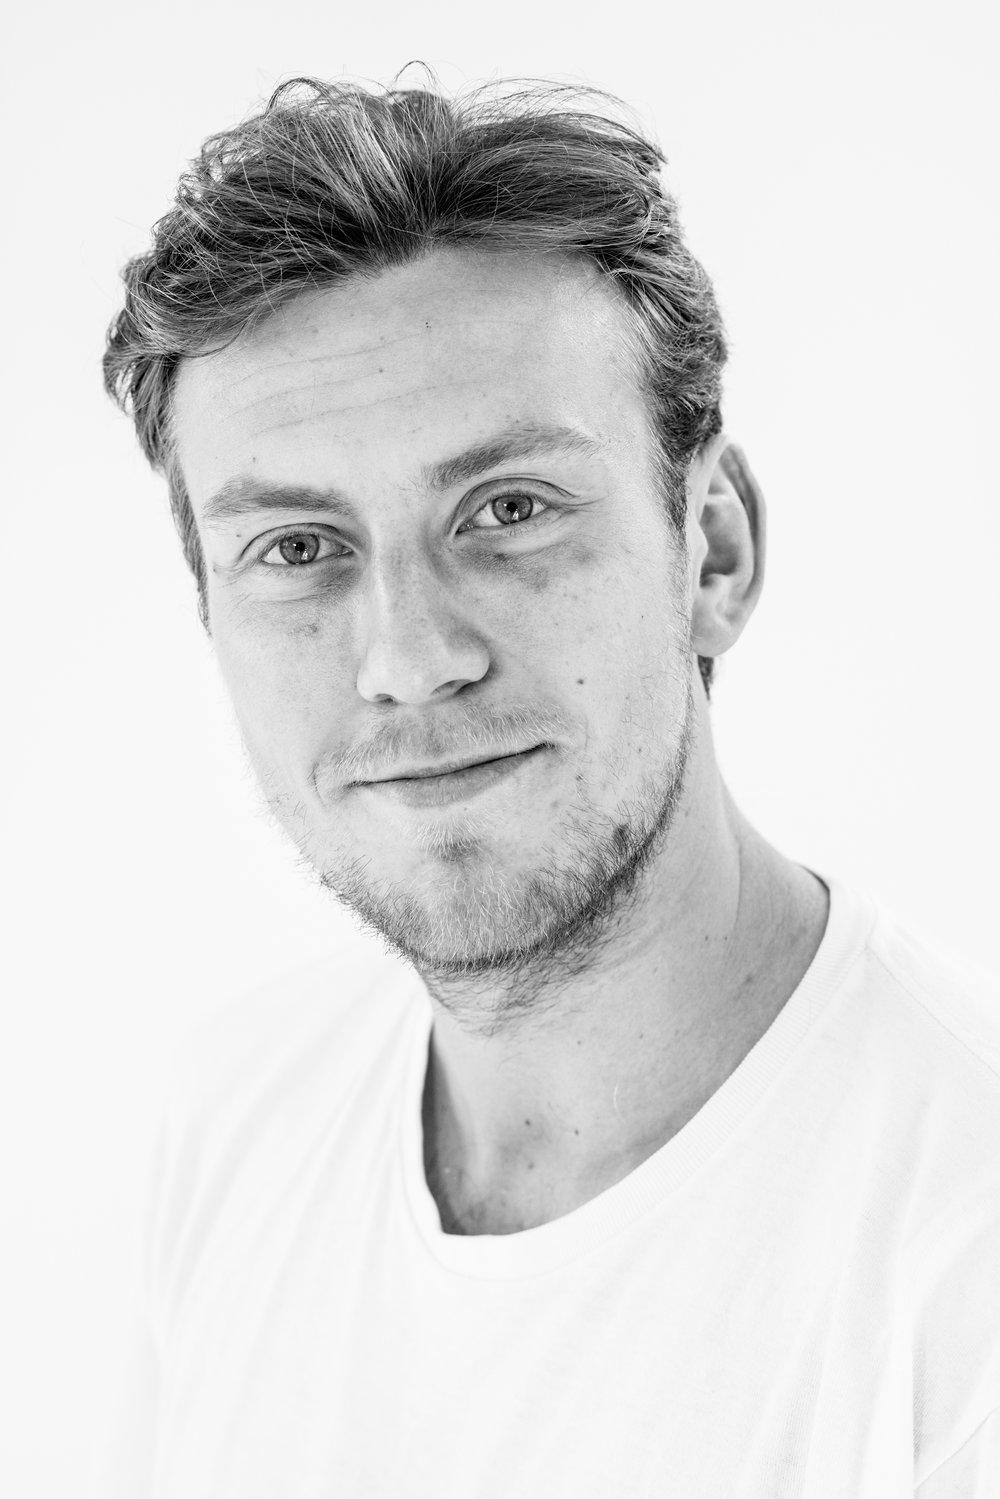 Jacob Ø Johansson